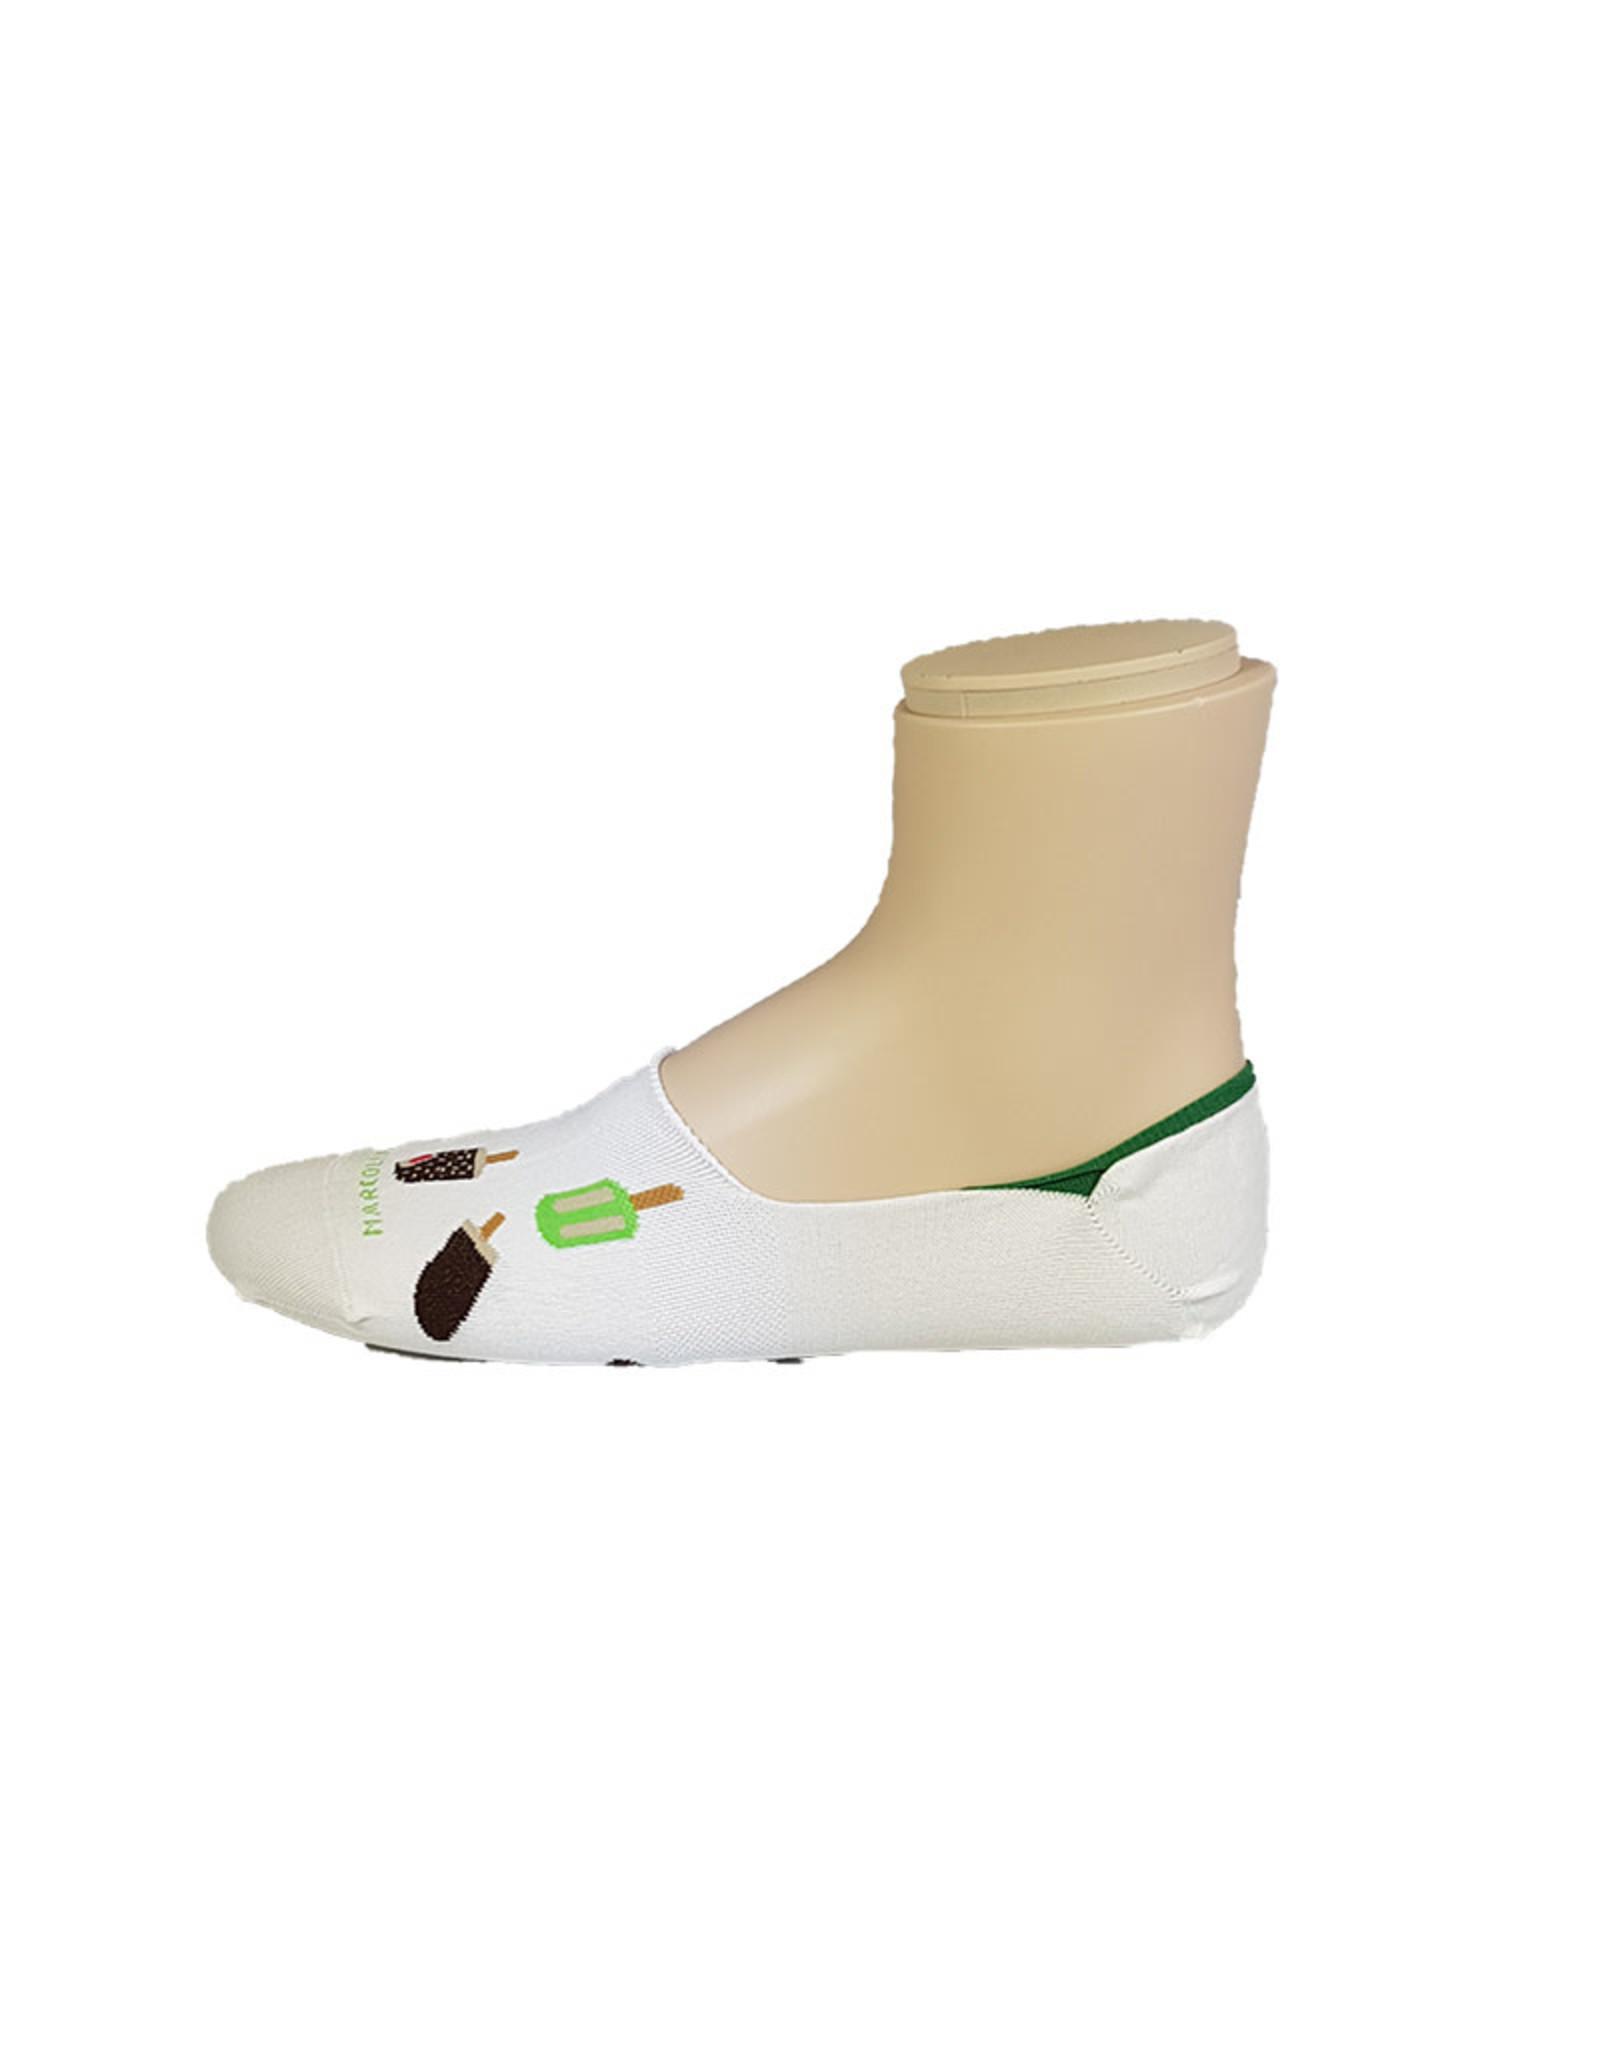 Marcoliani Marcoliani sokken wit ijsjes Invisible 4379S